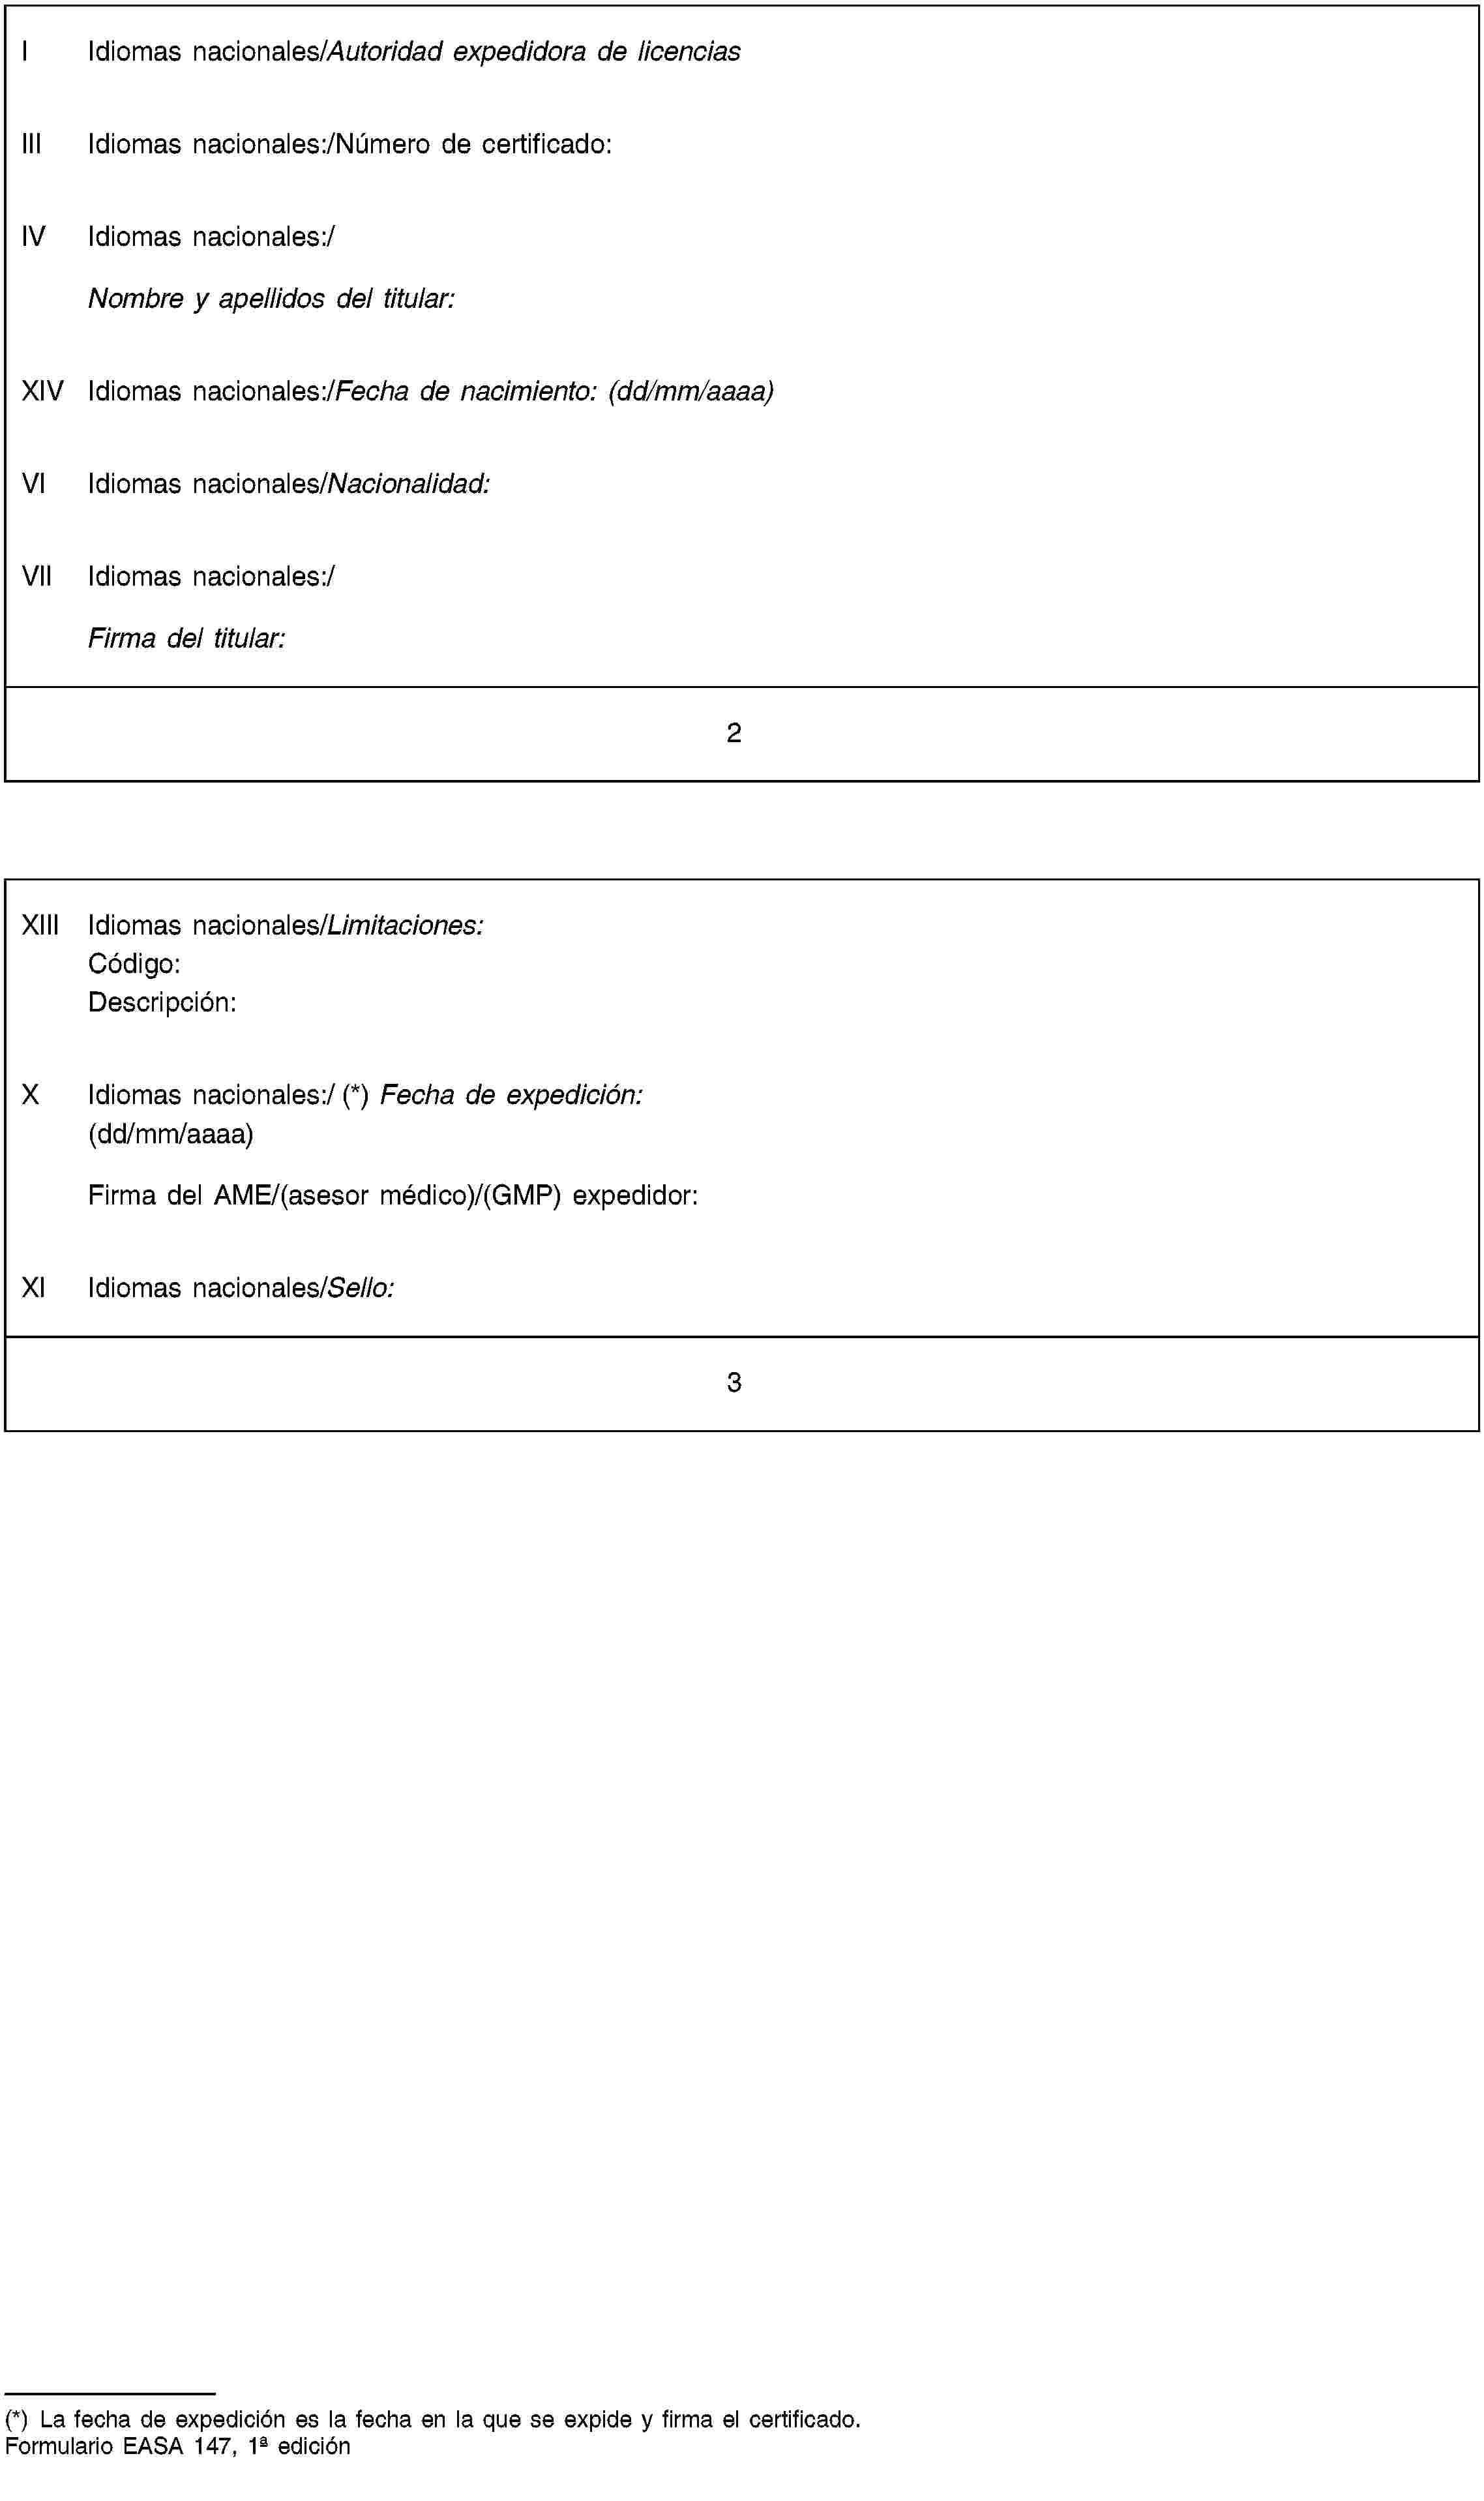 EUR-Lex - 02011R1178-20140217 - EN - EUR-Lex